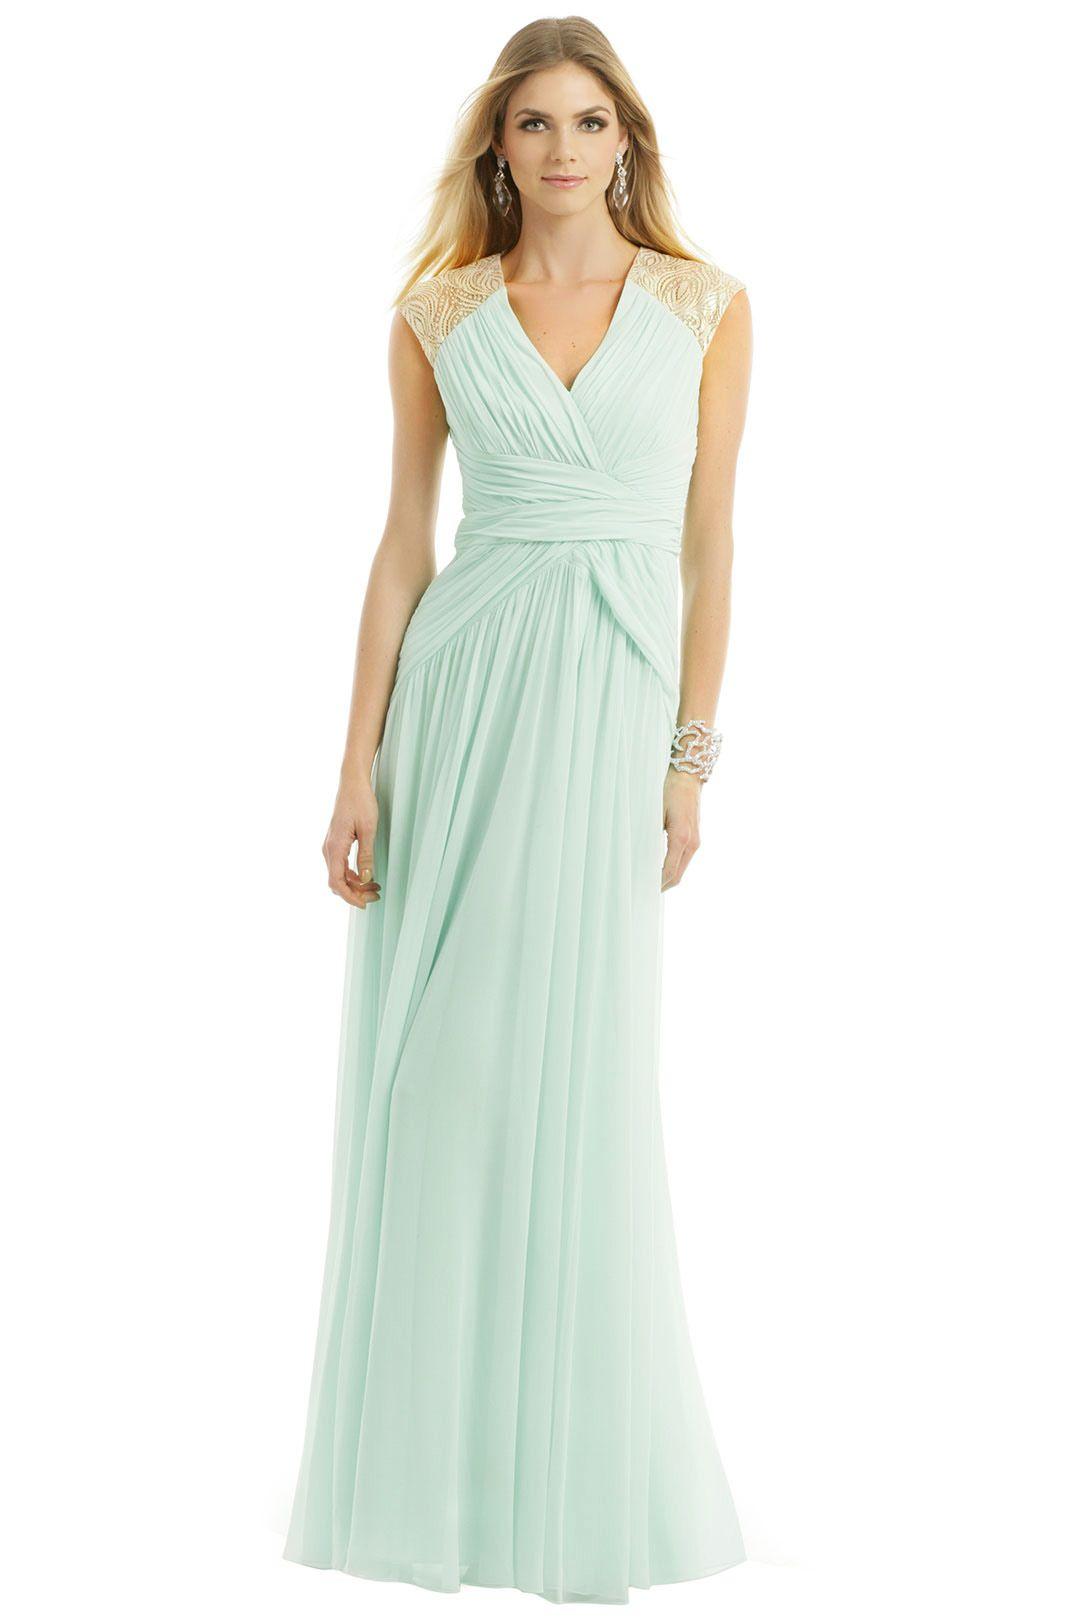 Badgley Mischka Mint Dream Gown. Rent the runway. Mint bridesmaid ...